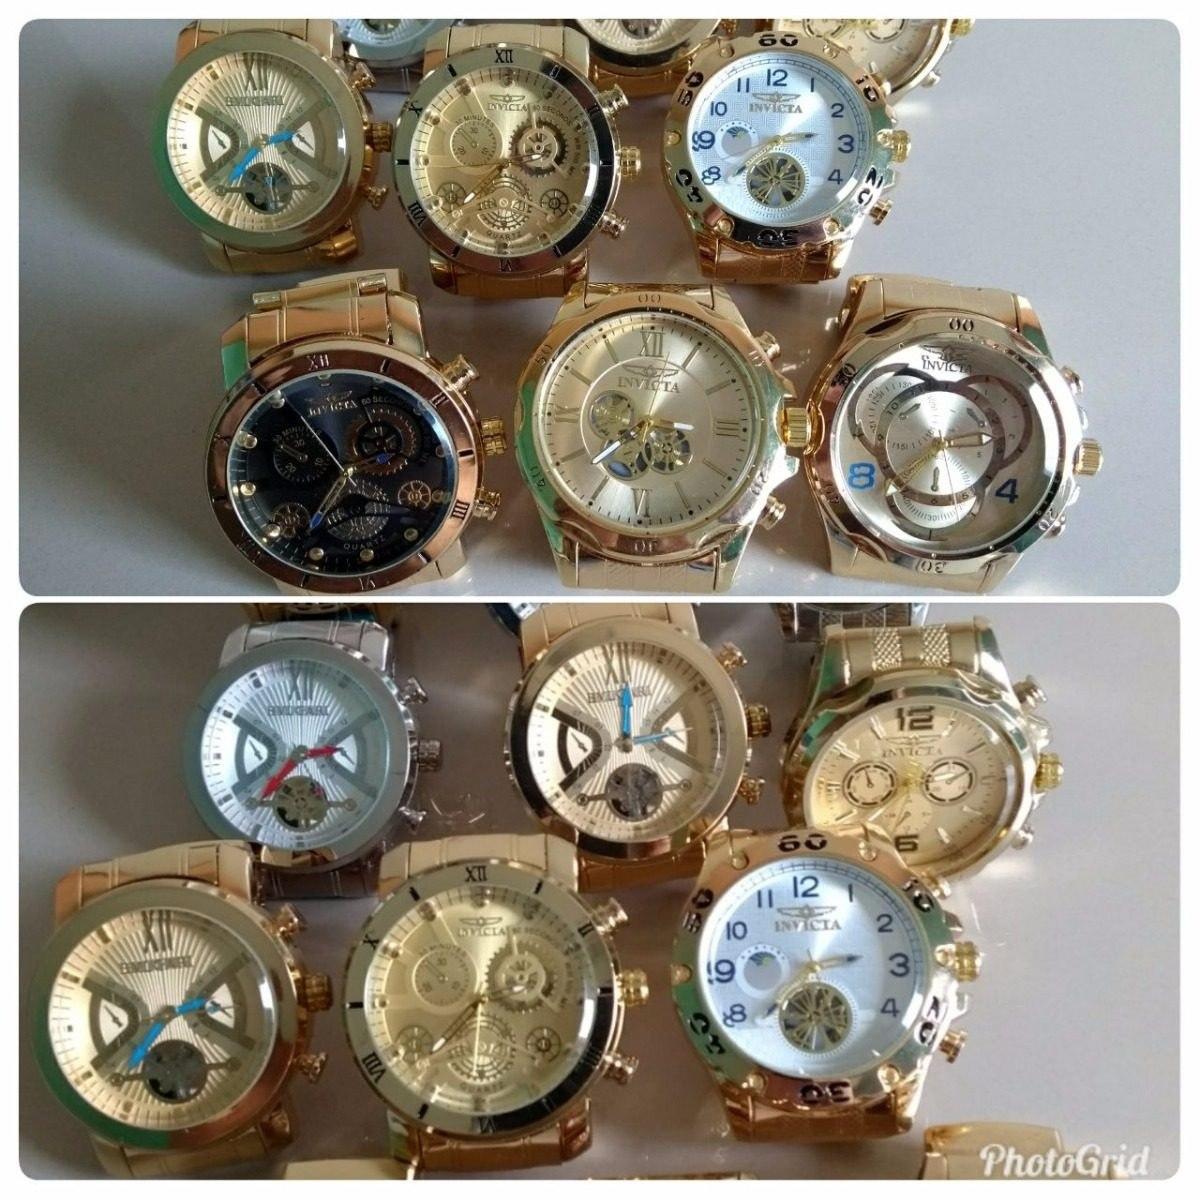 f764cbba56f 10 Relógios Pulseira Aço Masculino Atacado E Revenda Barato - R  194 ...